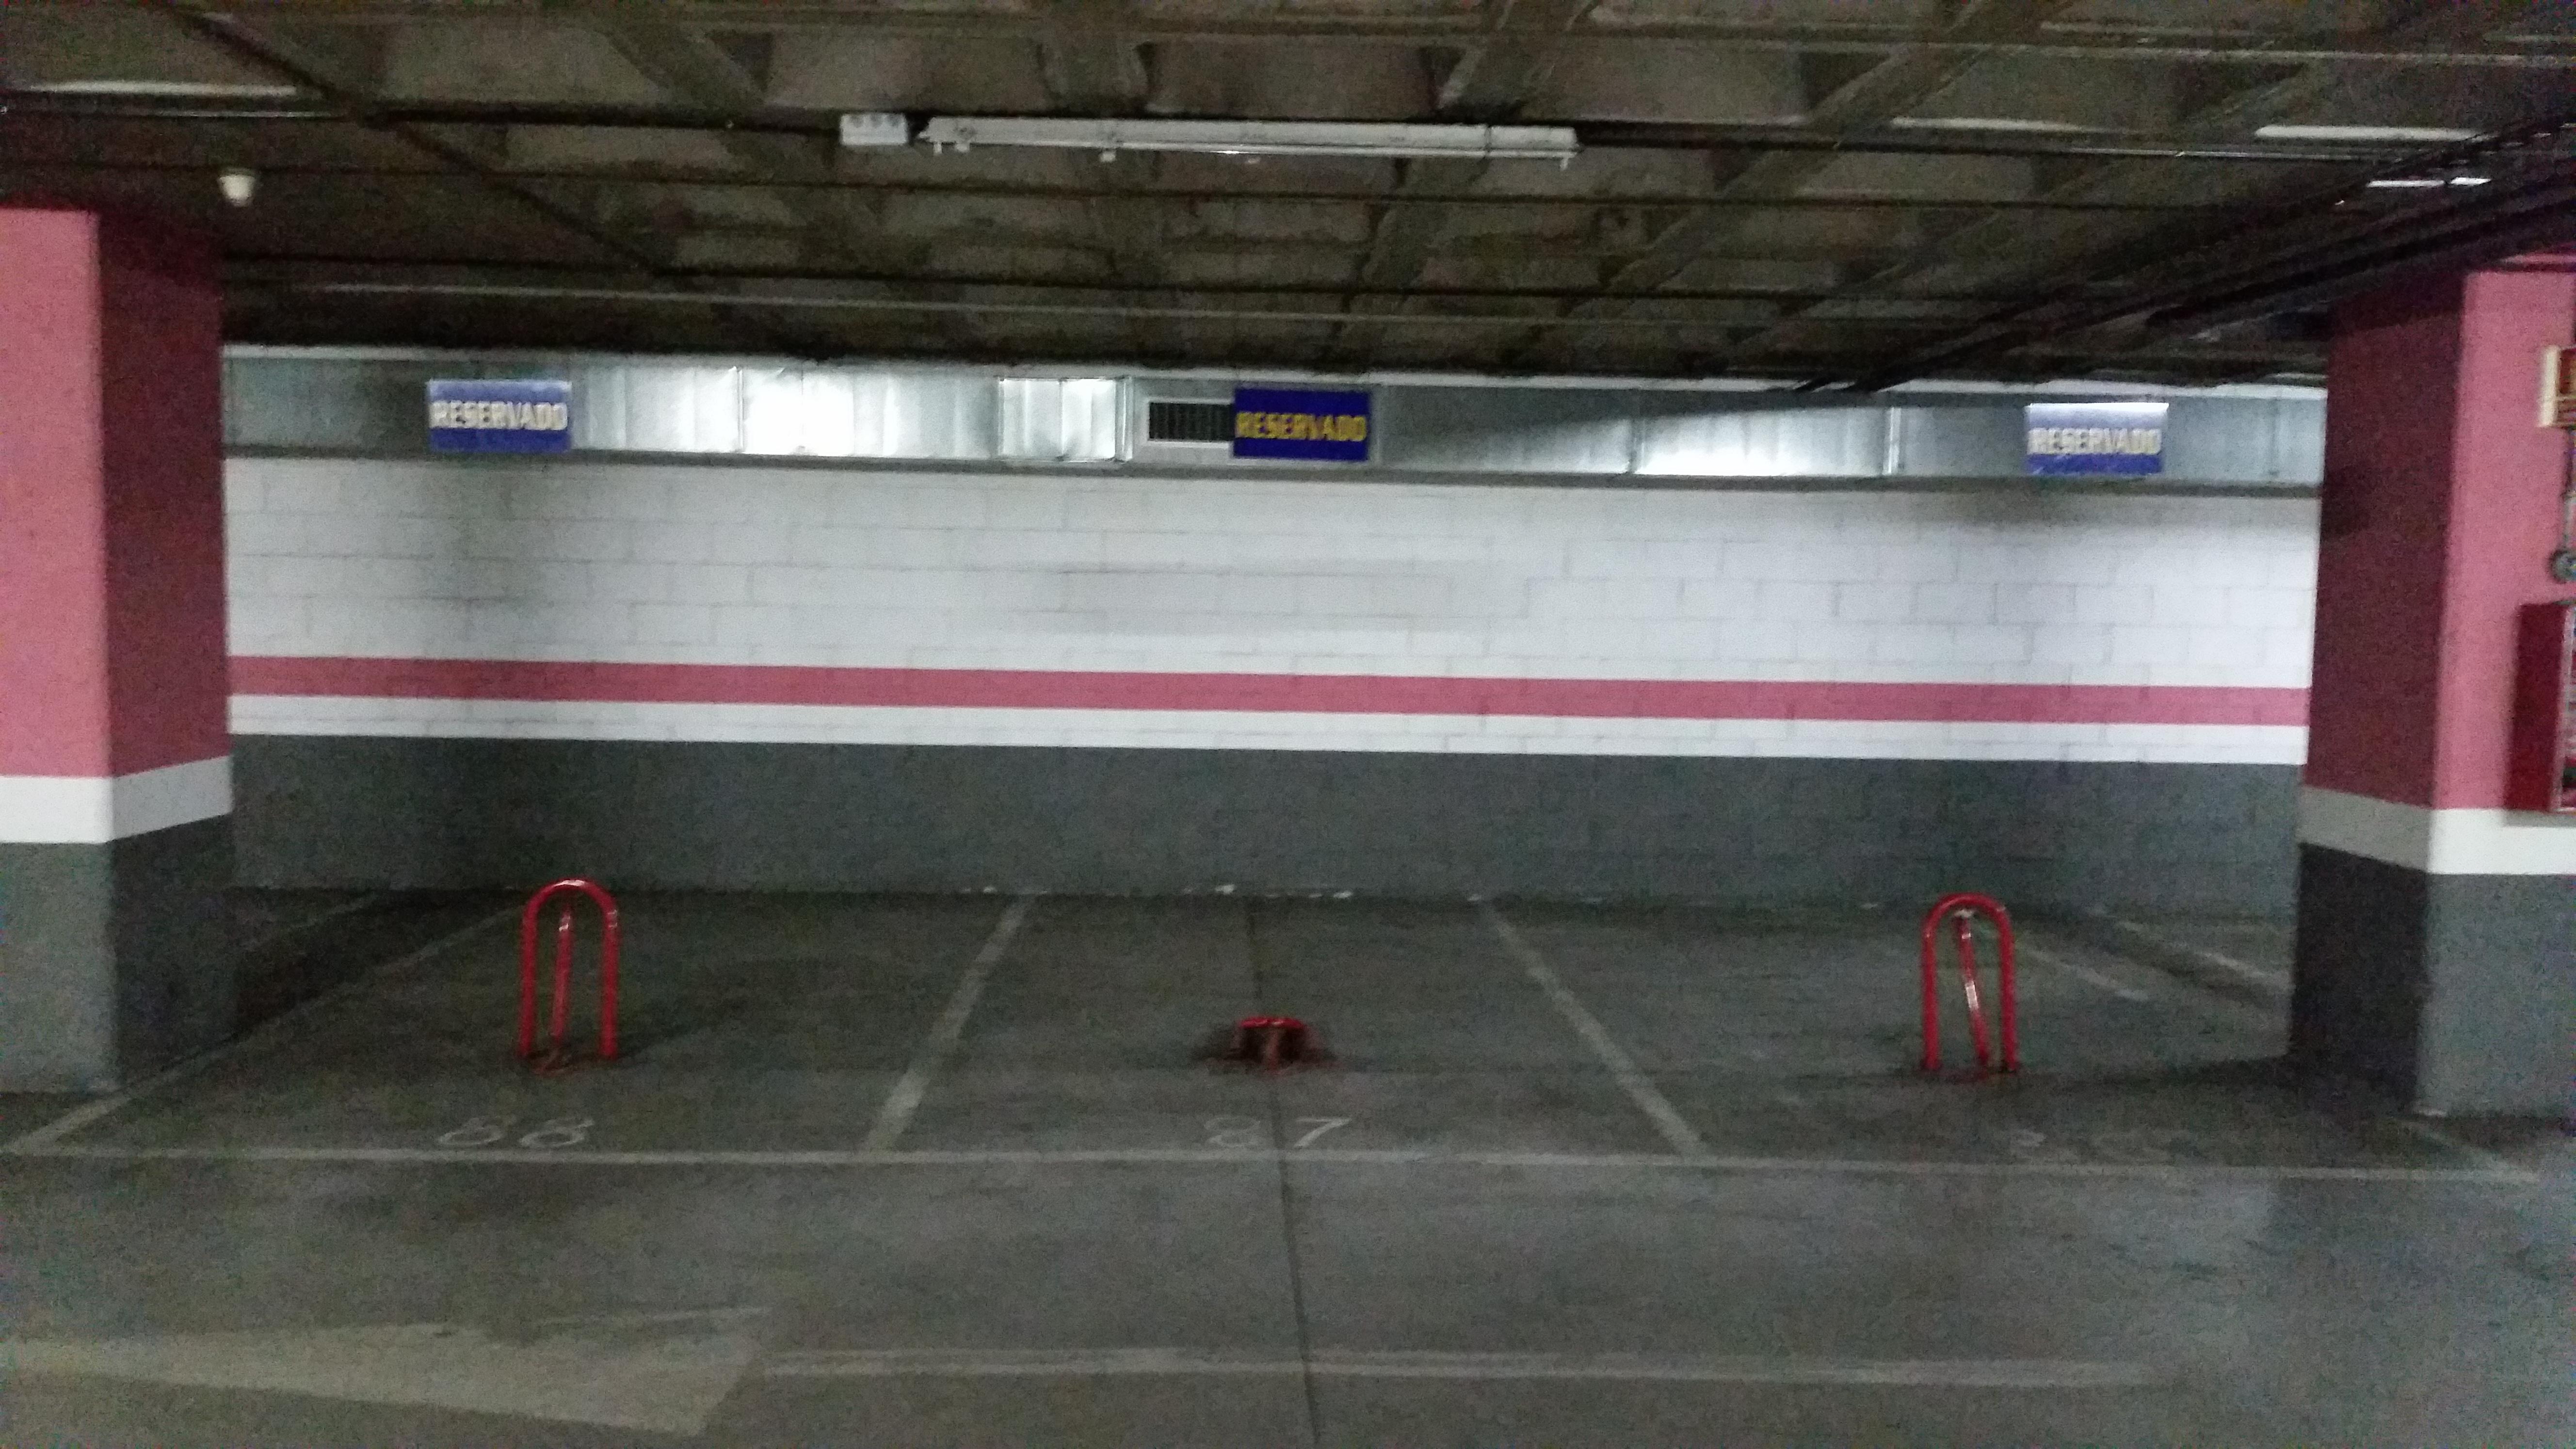 7 plazas de garaje en centro comercial alcal norte - Comprar plaza de garaje ...